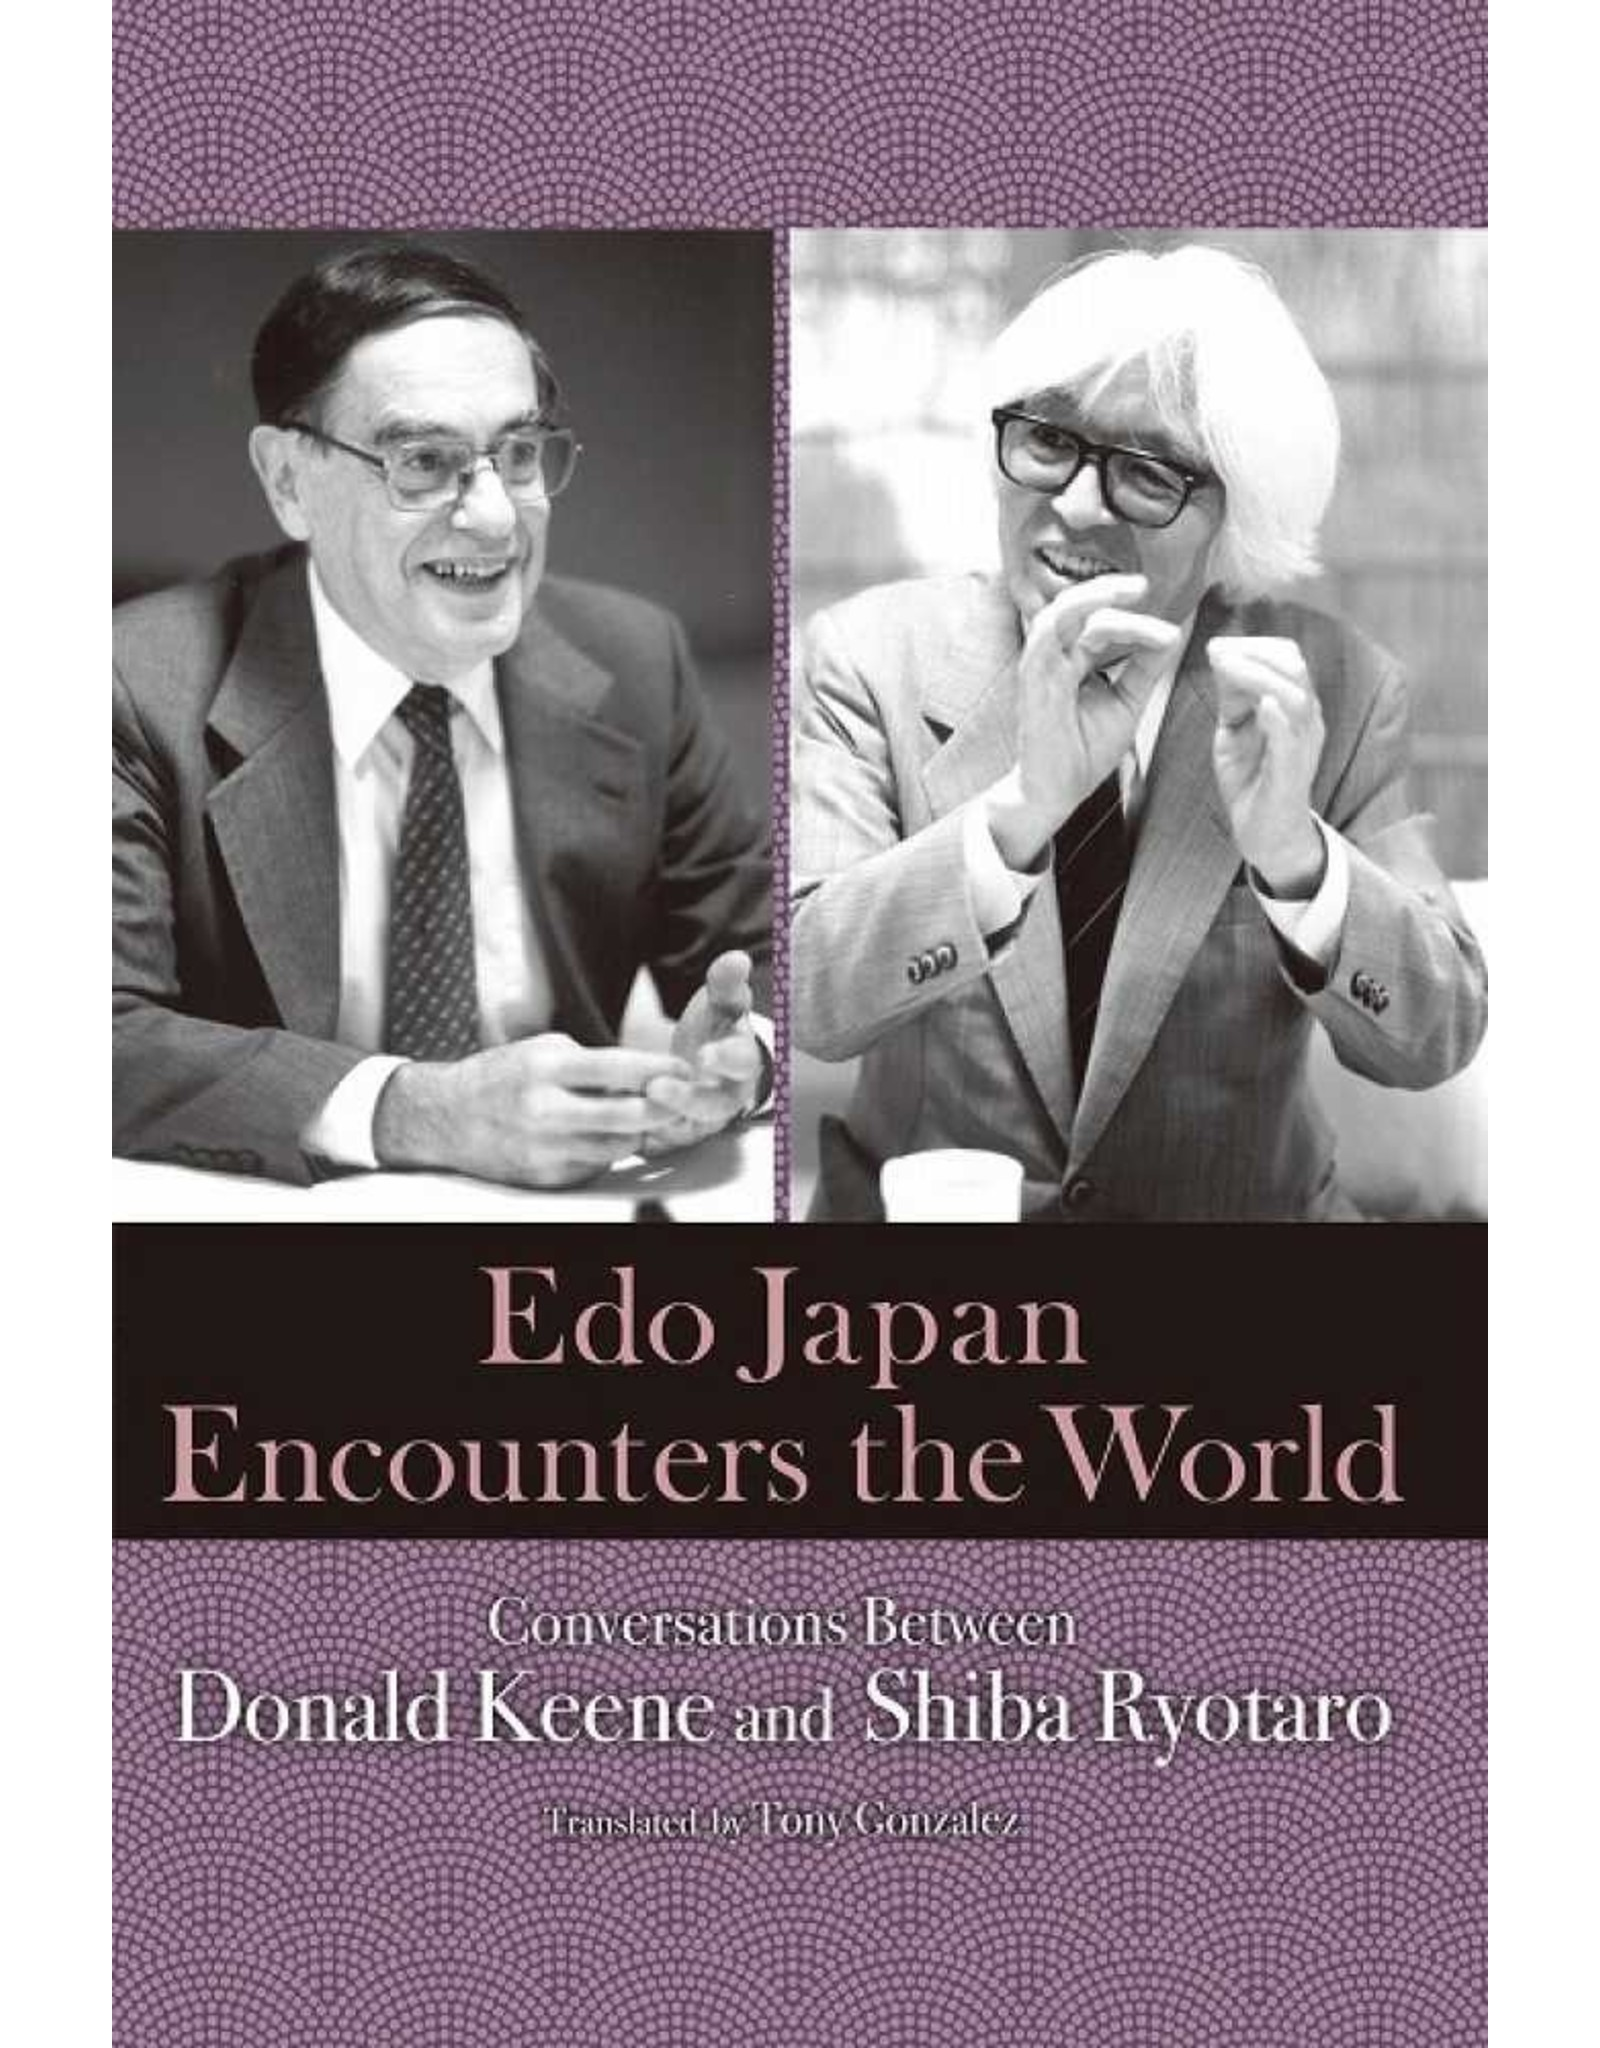 JPIC Edo Japan Encounters the World